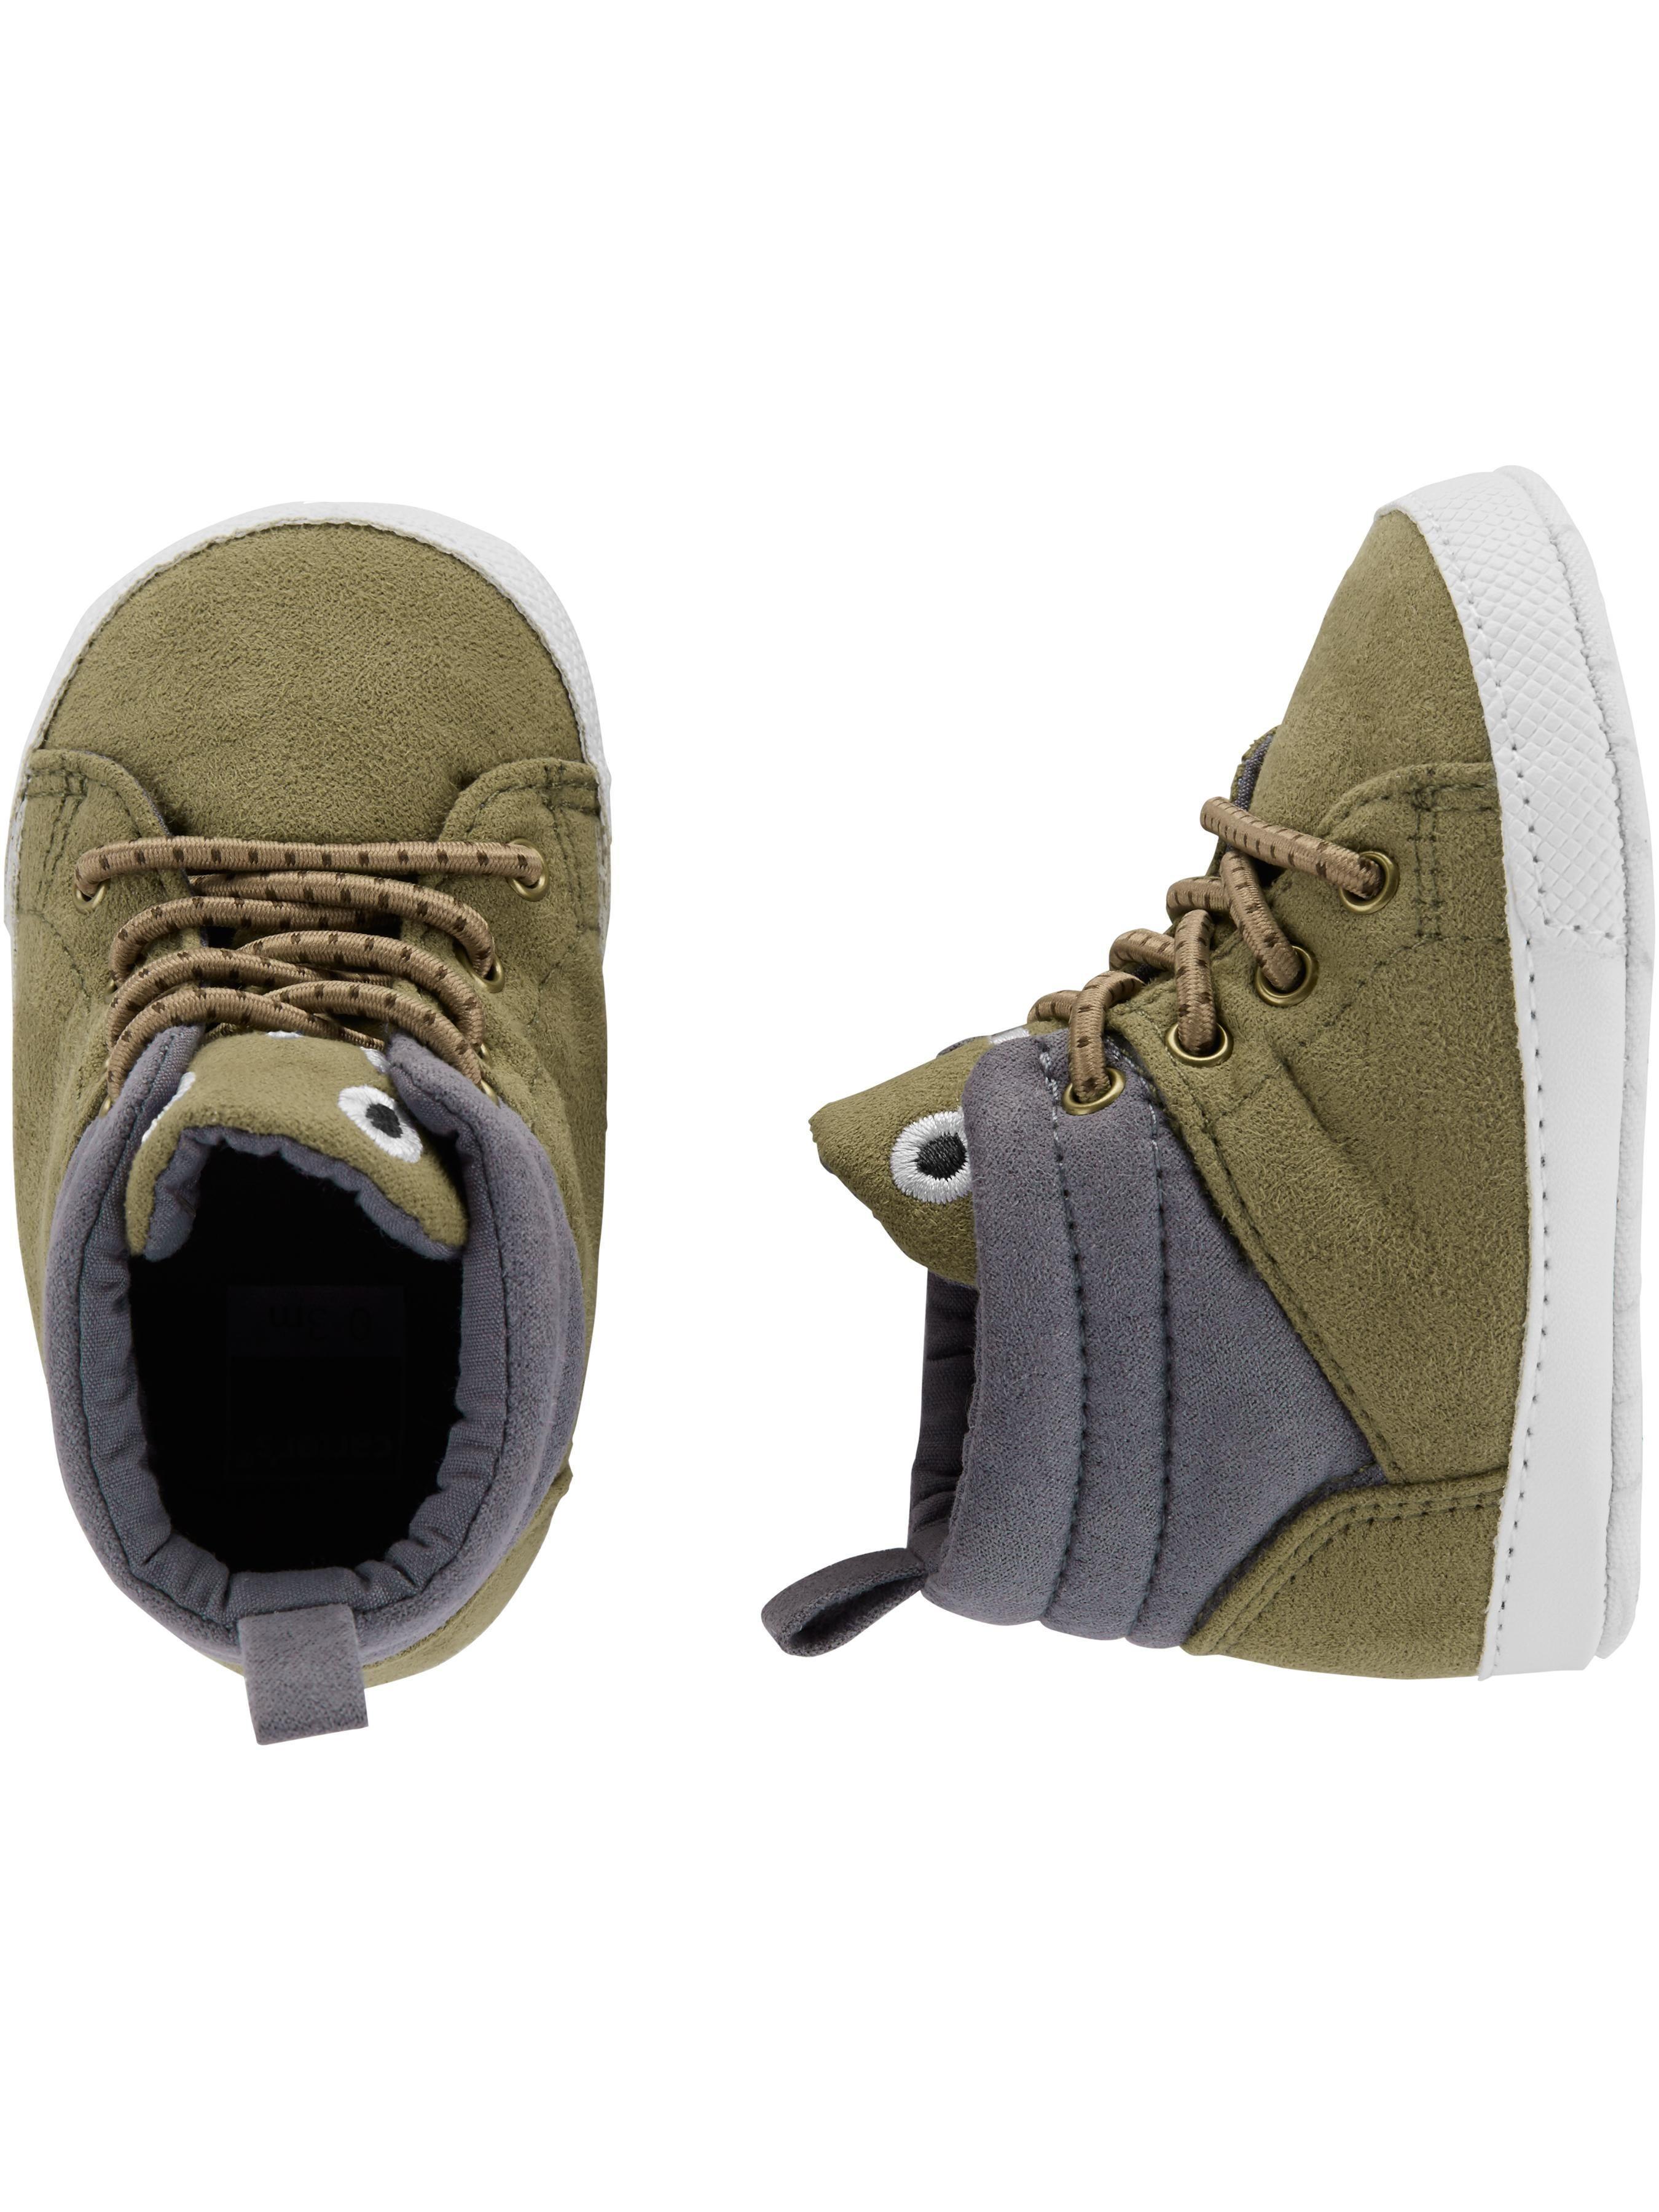 cf6d08089 Baby Boy Carter s Monster Boot Baby Shoes